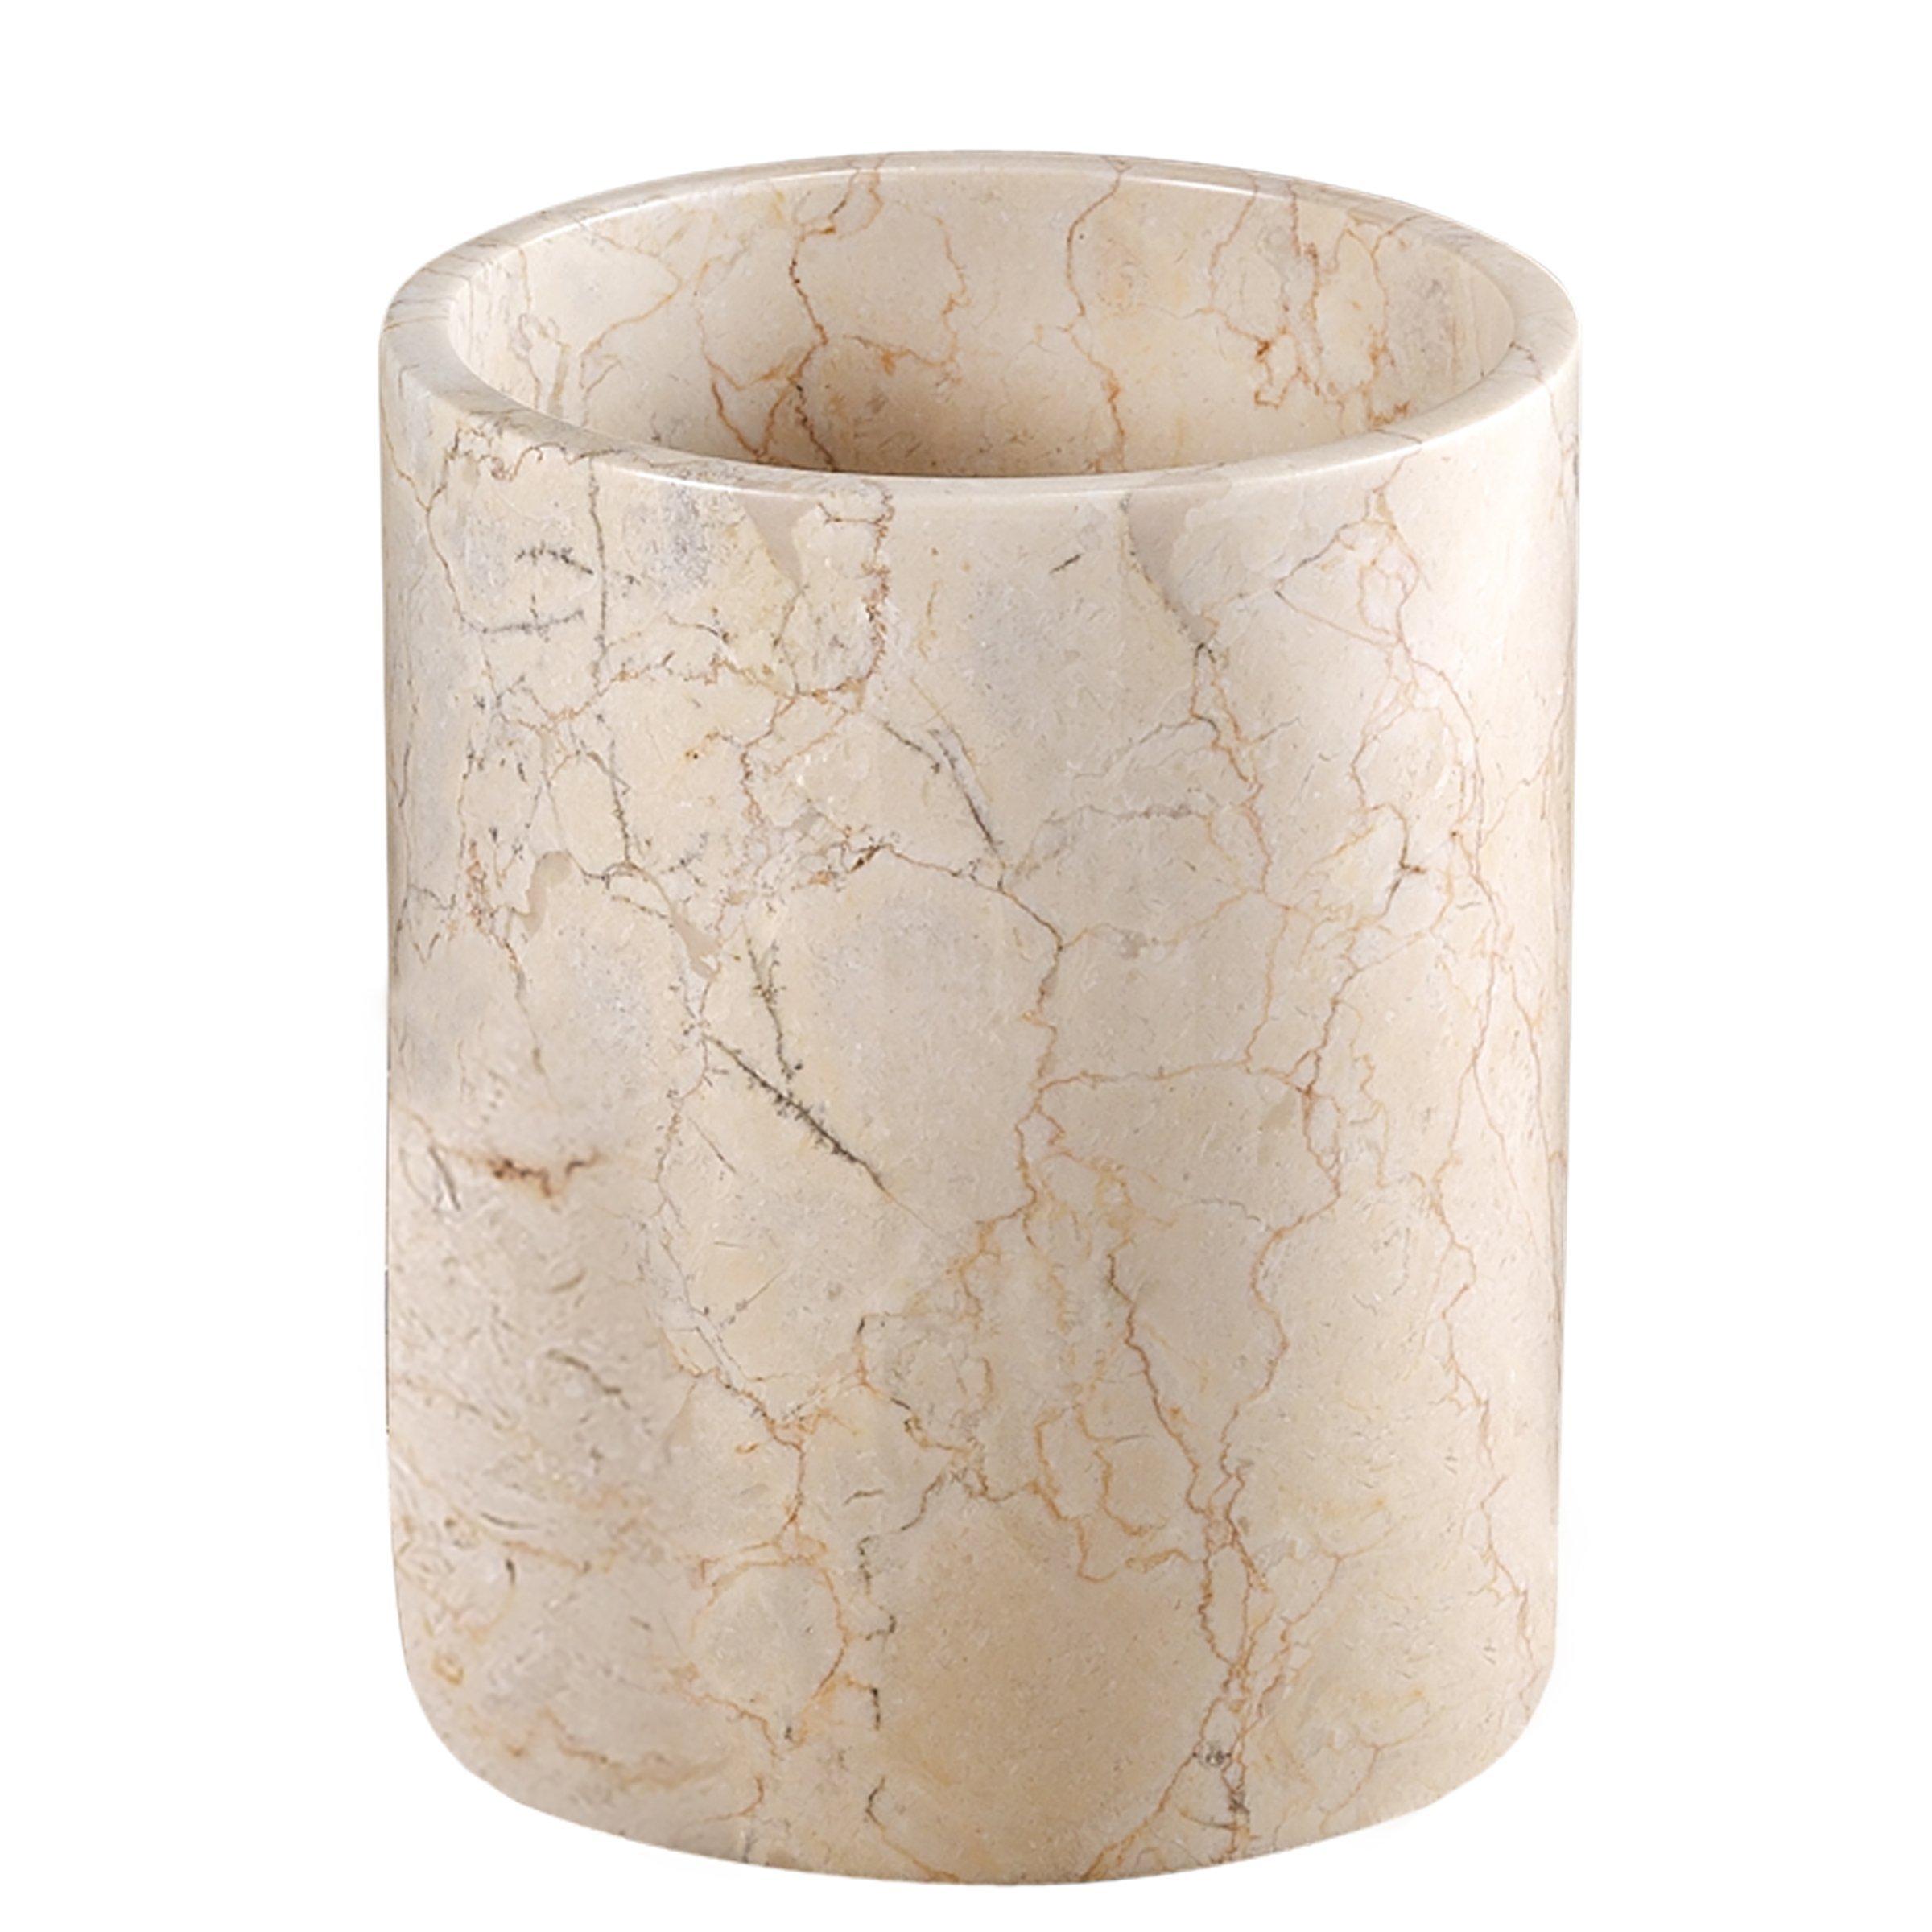 Creative Home Champagne Marble SPA Collection Wastebasket, Trash Bin, 7-7/8'' x 9-1/2''H, Beige